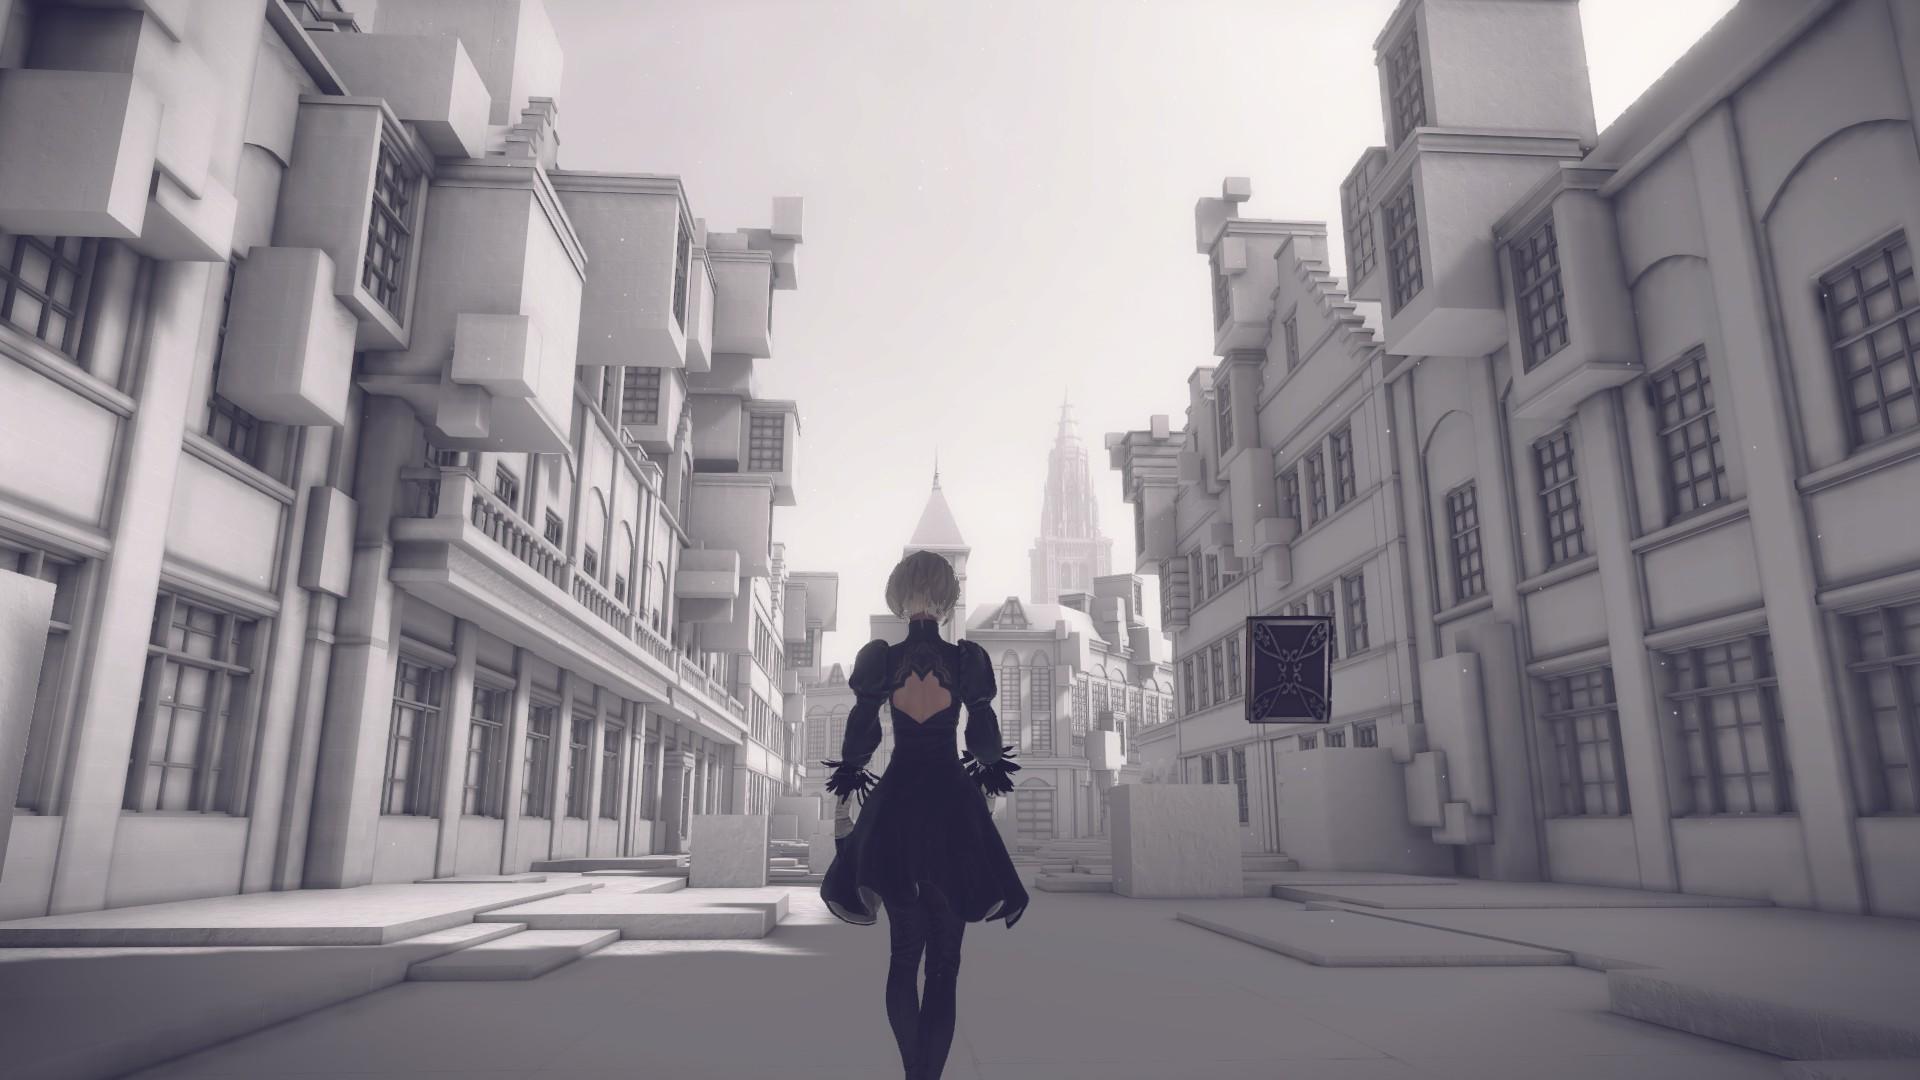 Nier Automata Hd Wallpaper Zerochan Anime Image Board